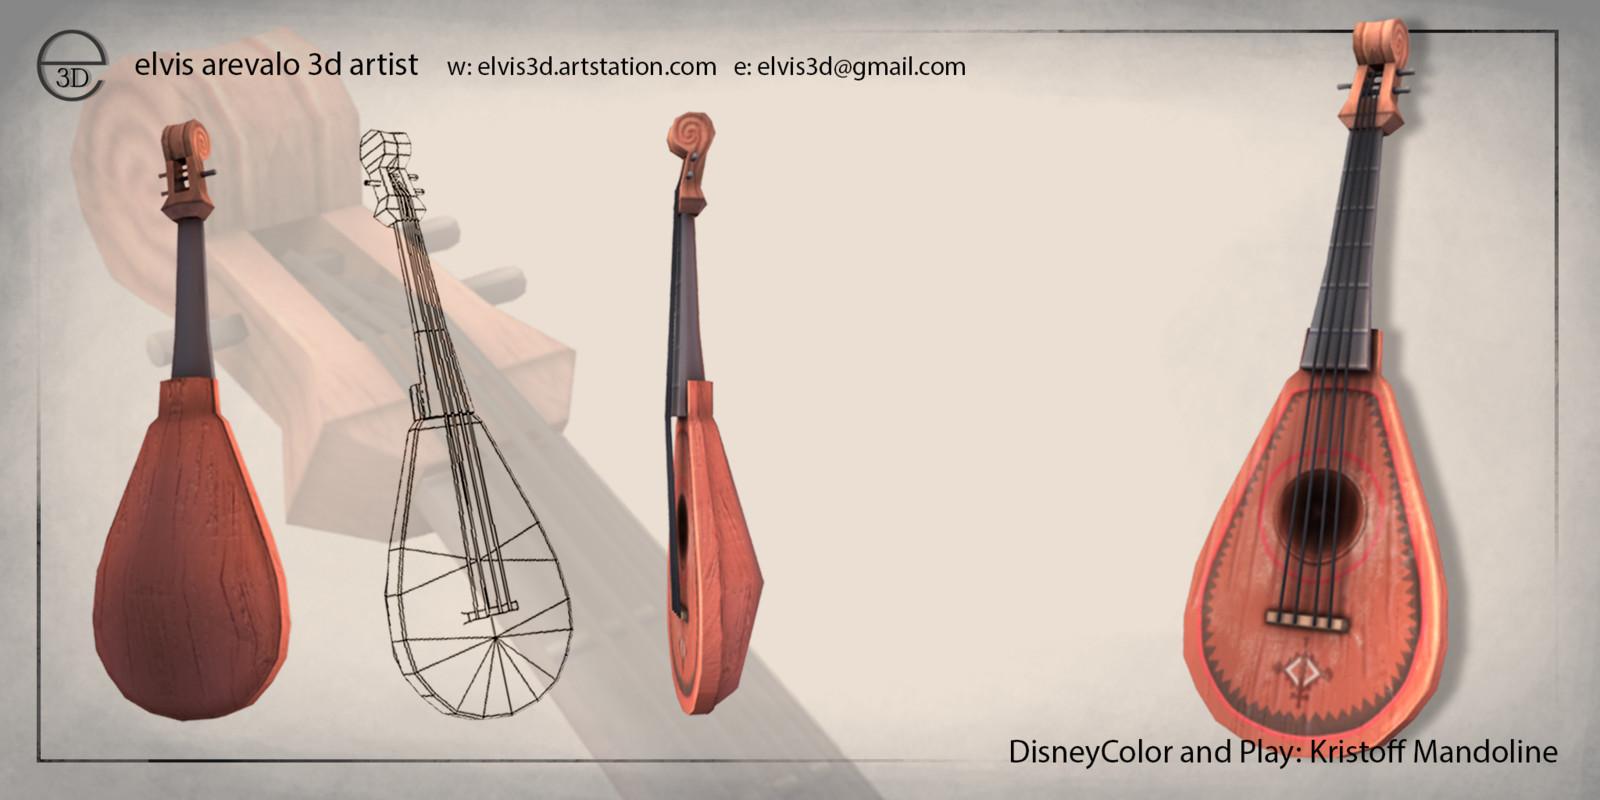 Kristoff Mandolin Model And texture